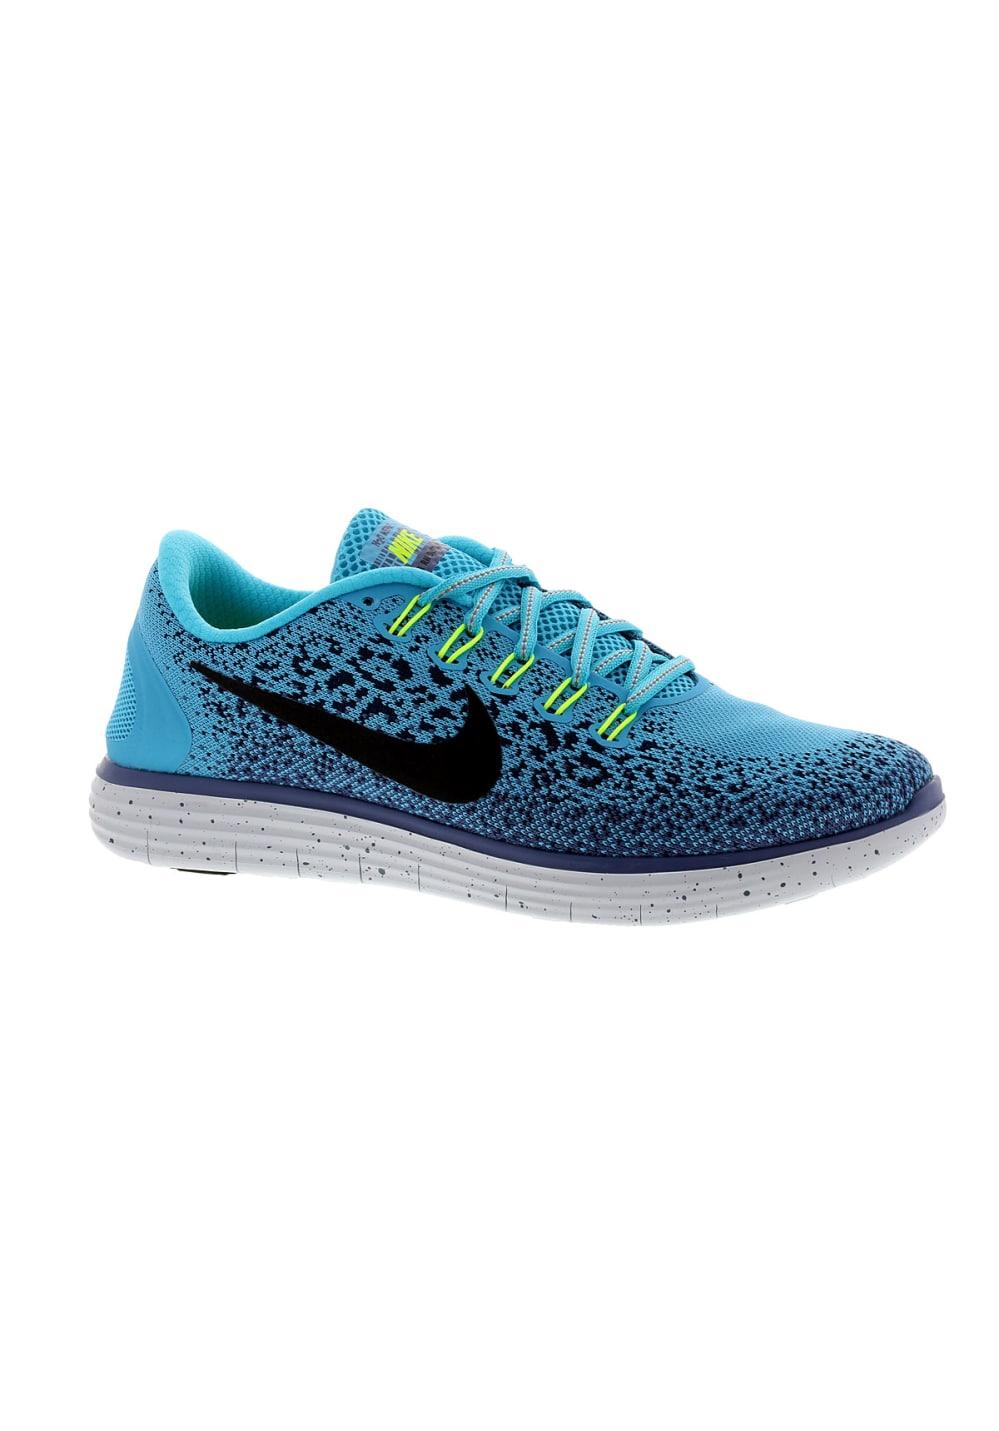 online retailer 26d59 d9184 Next. Nike. Free RN Distance Shield - Zapatillas de running para Mujer